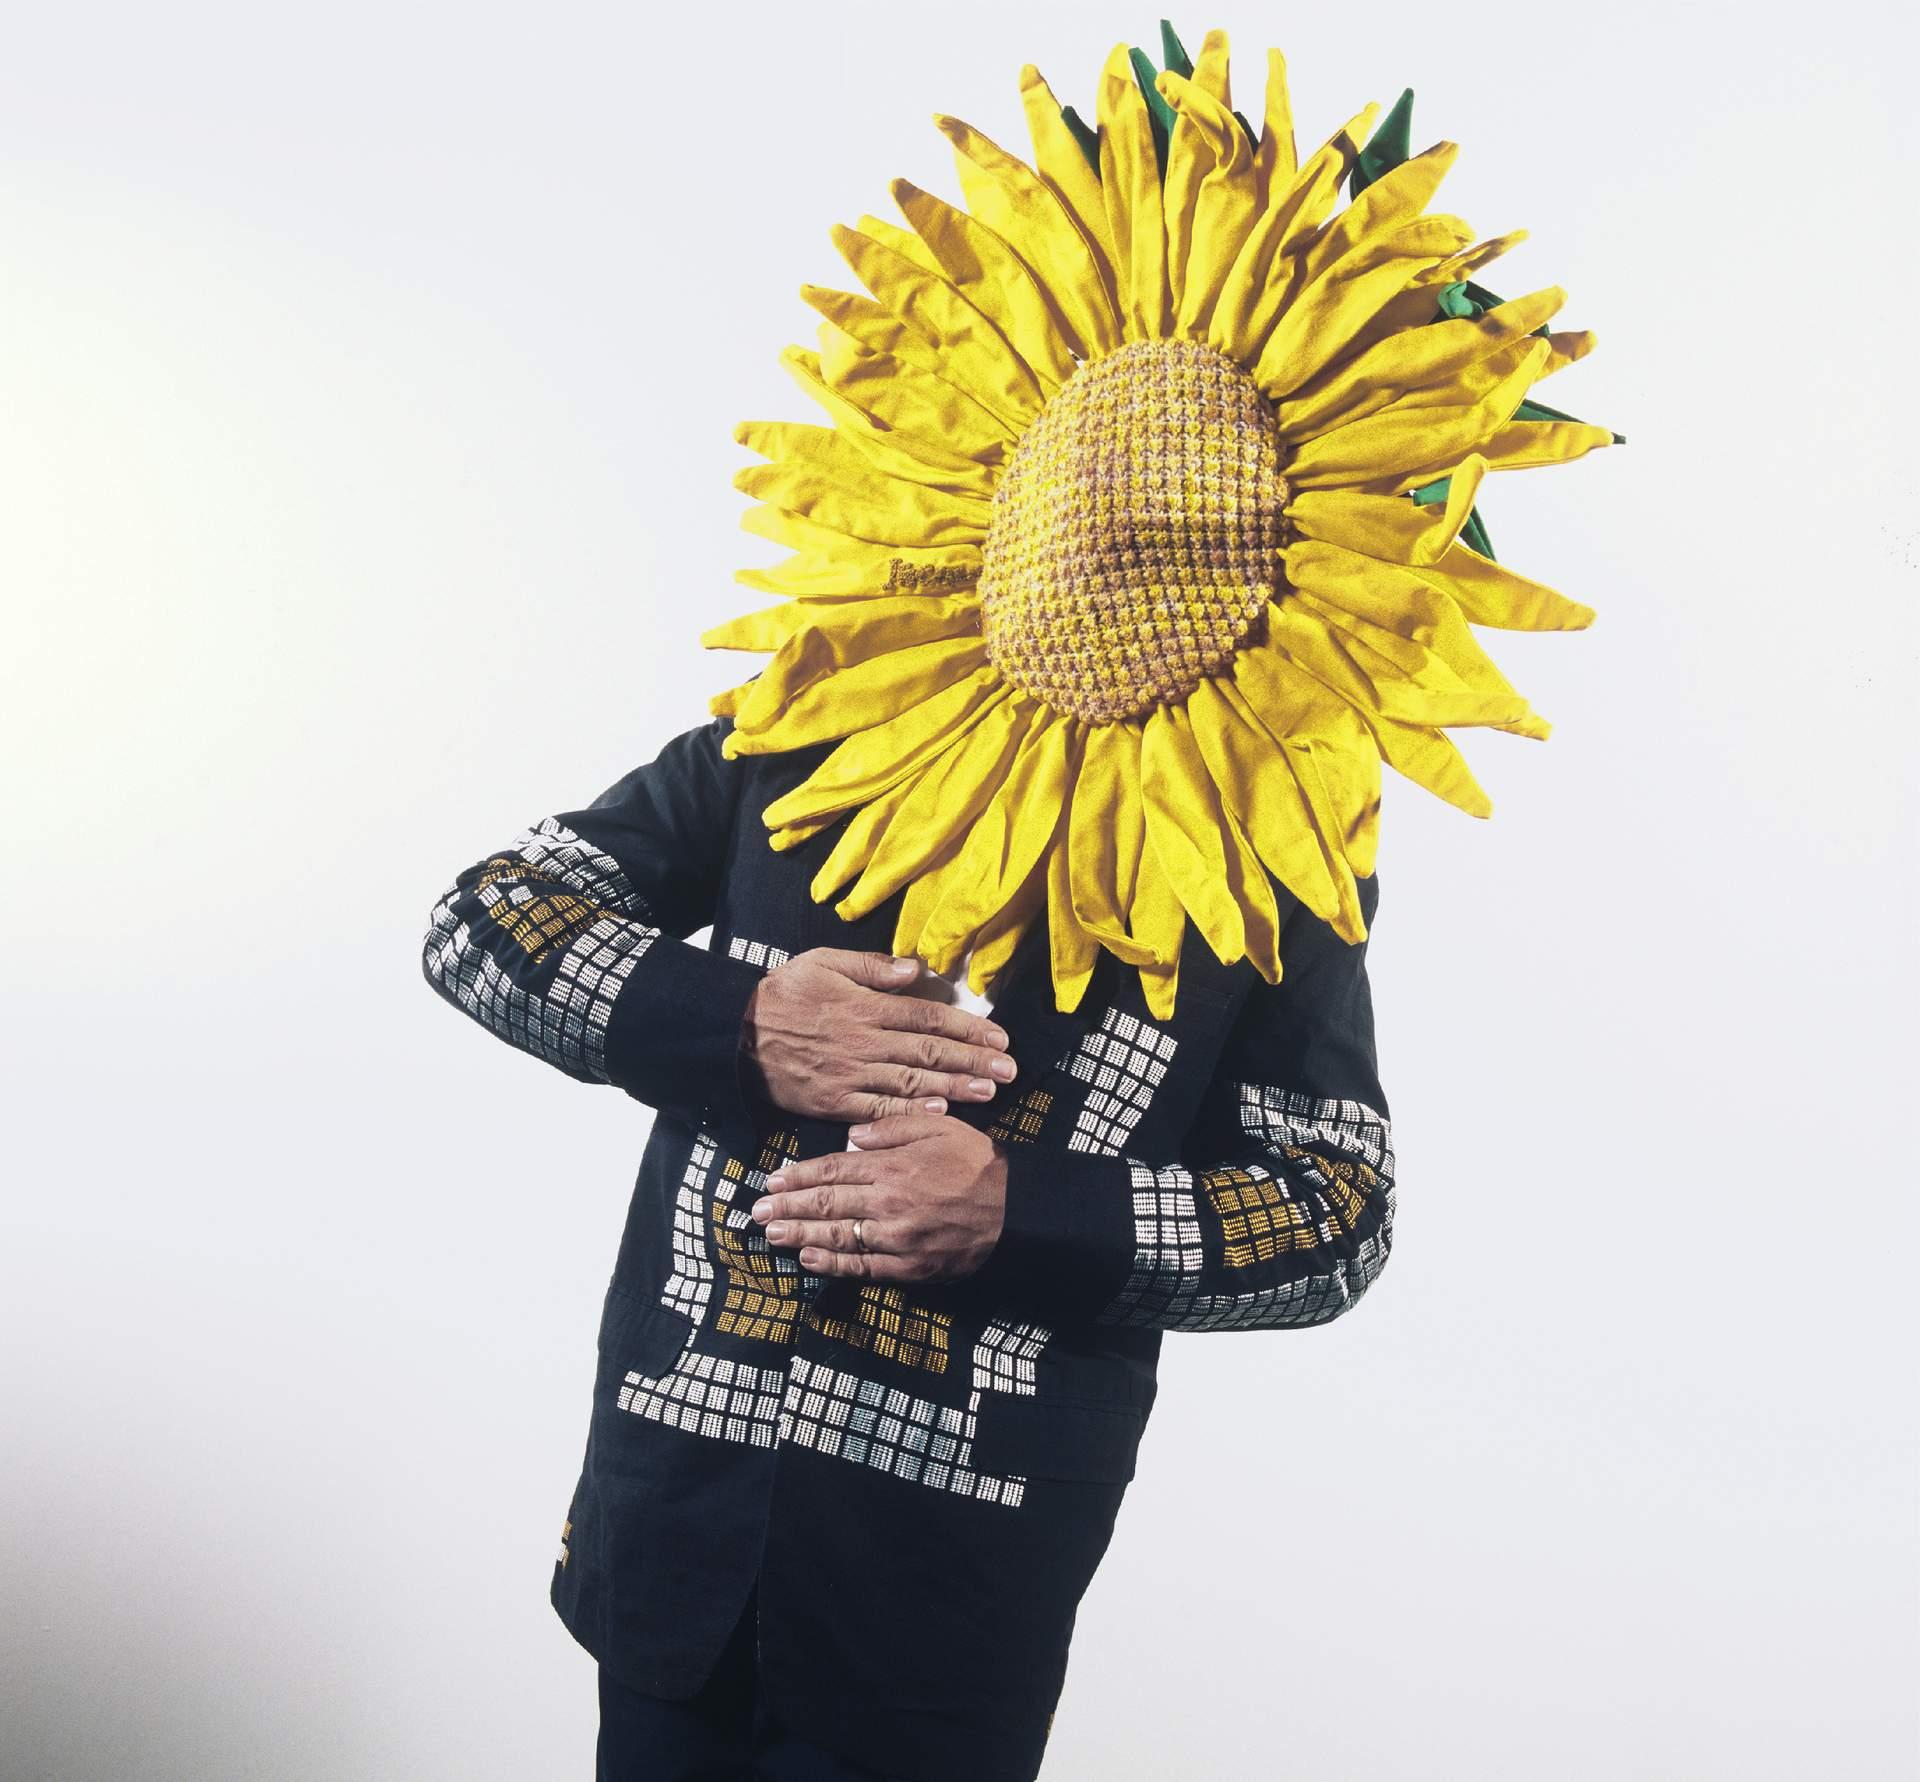 In my Sunflower headress designed by Jacqui Frye, 1987